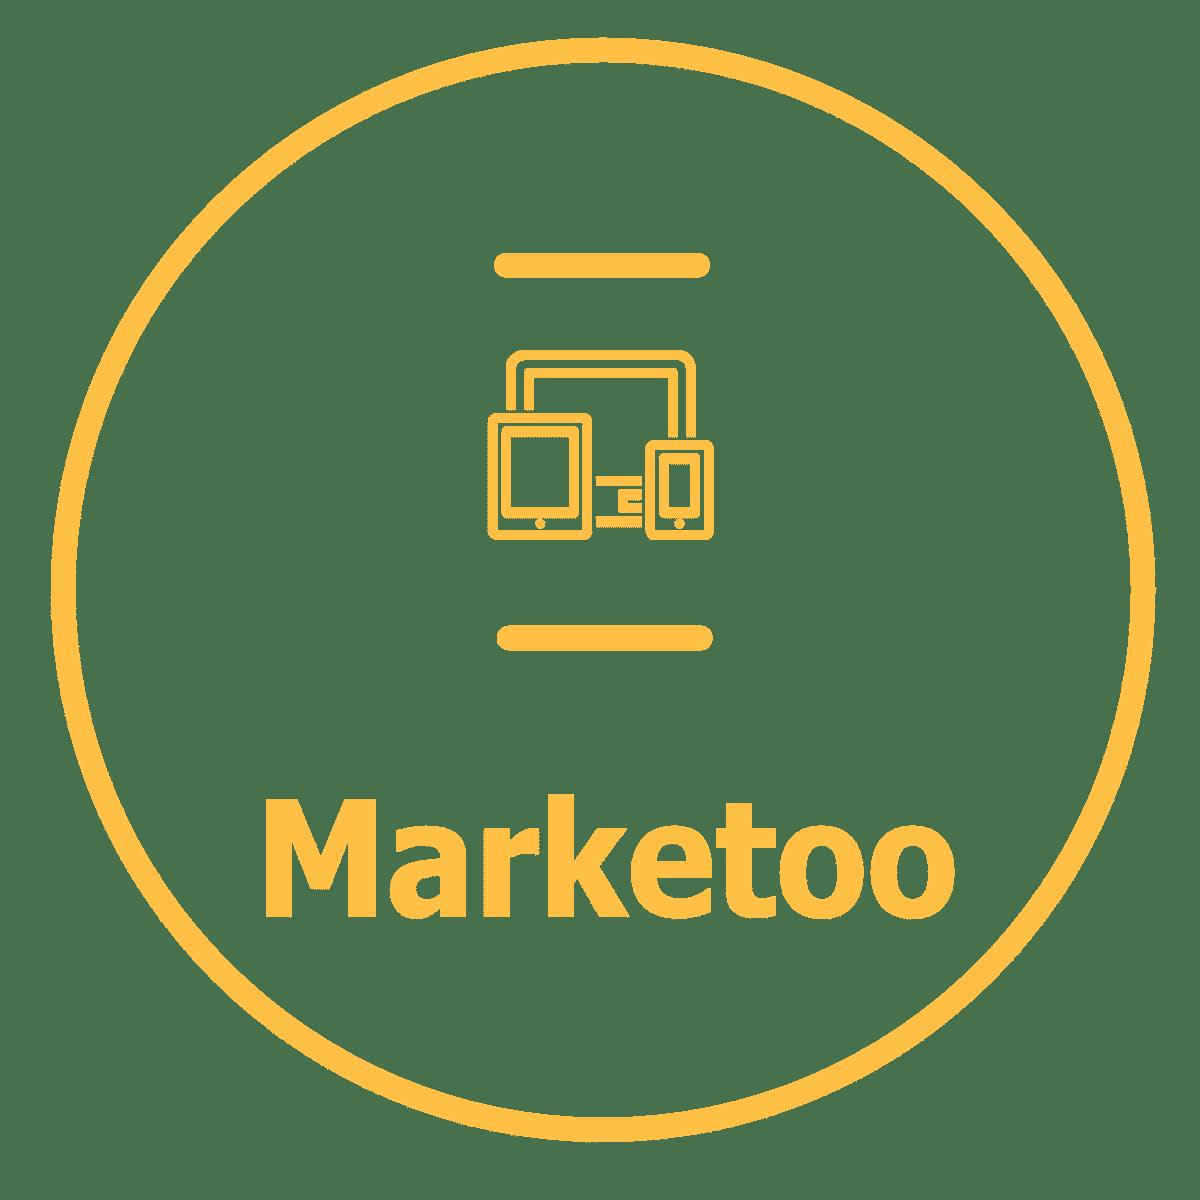 Marketoo